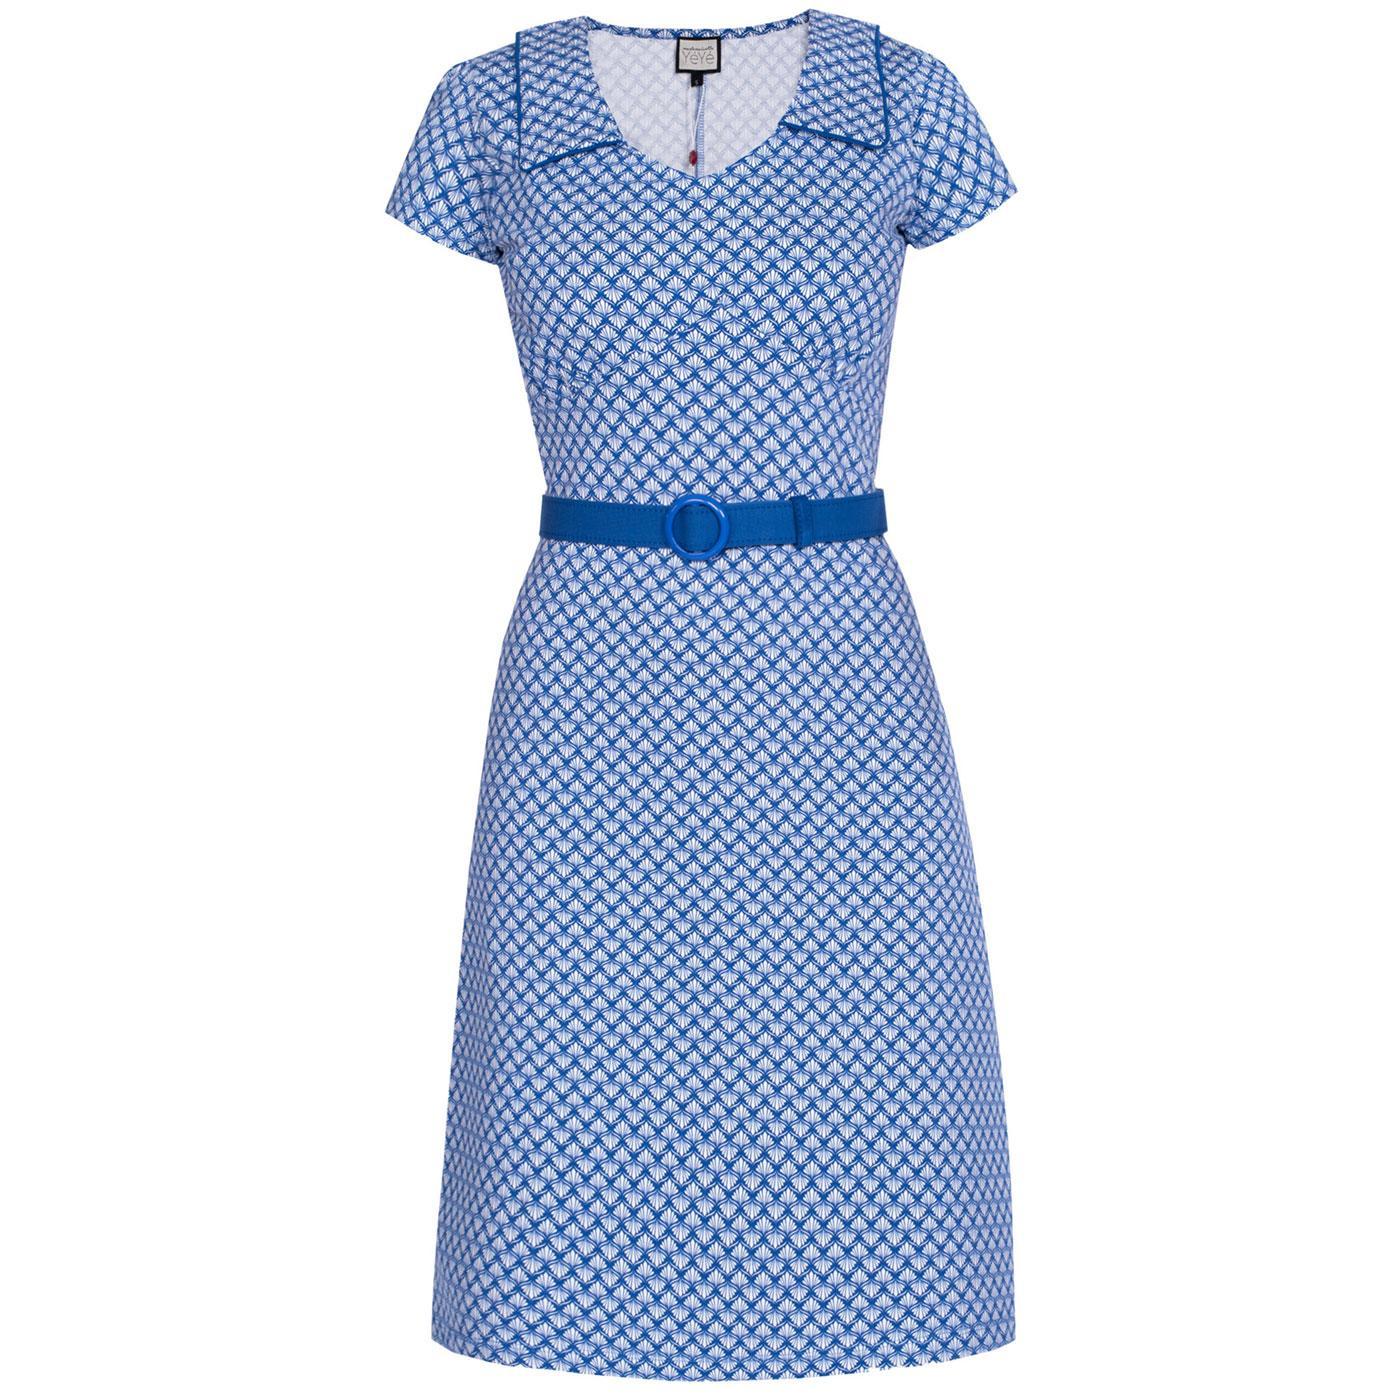 Vintage Moments MADEMOISELLE YEYE Retro Mod Dress